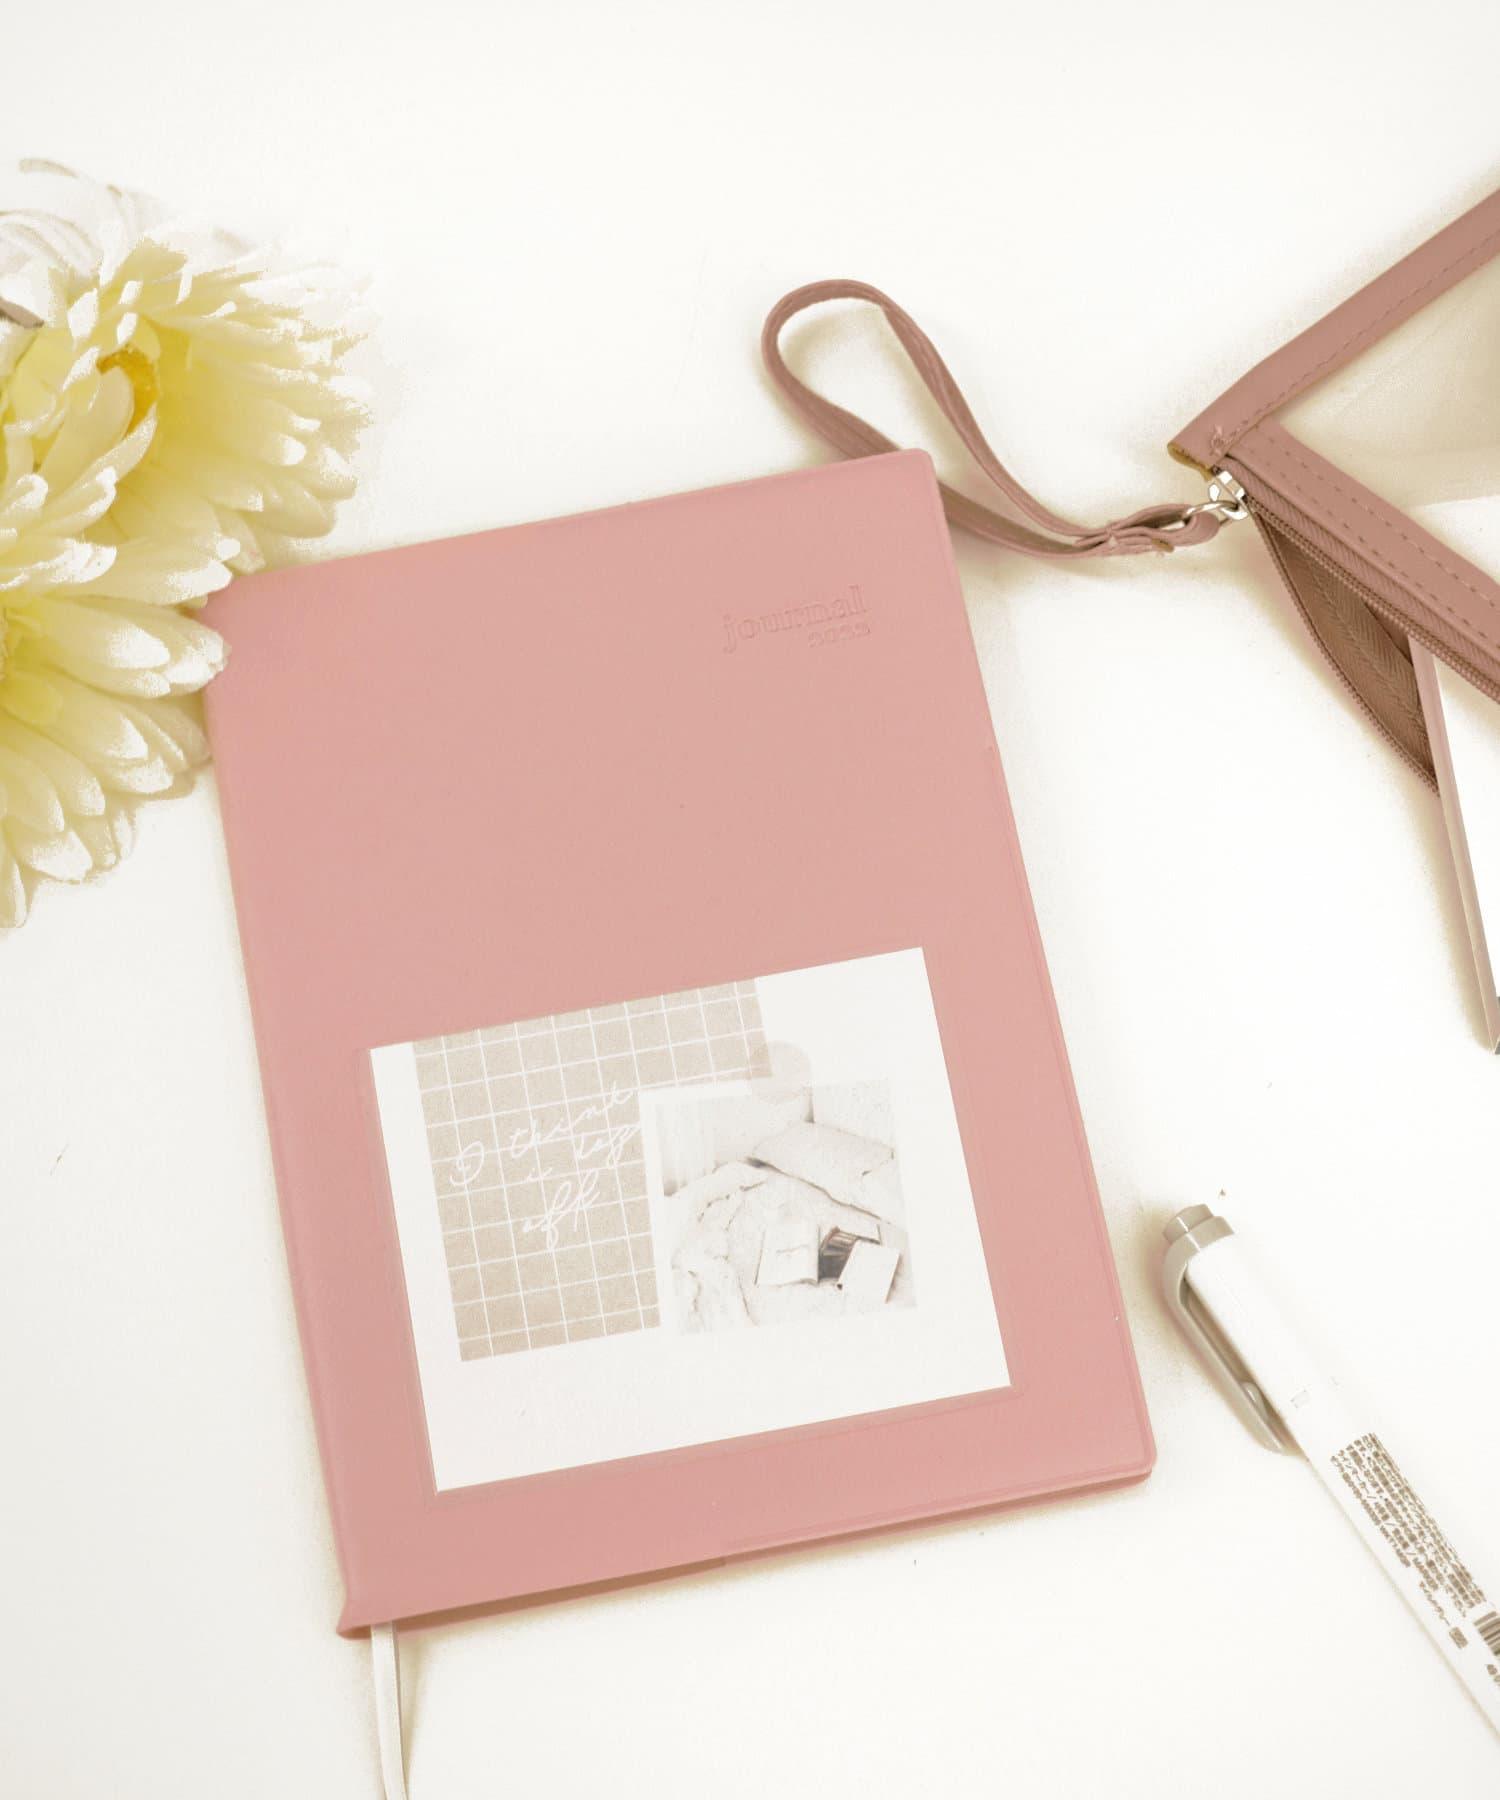 3COINS(スリーコインズ) ライフスタイル 【MY SCHEDULE】 B6サイズポケット付き手帳 ピンク